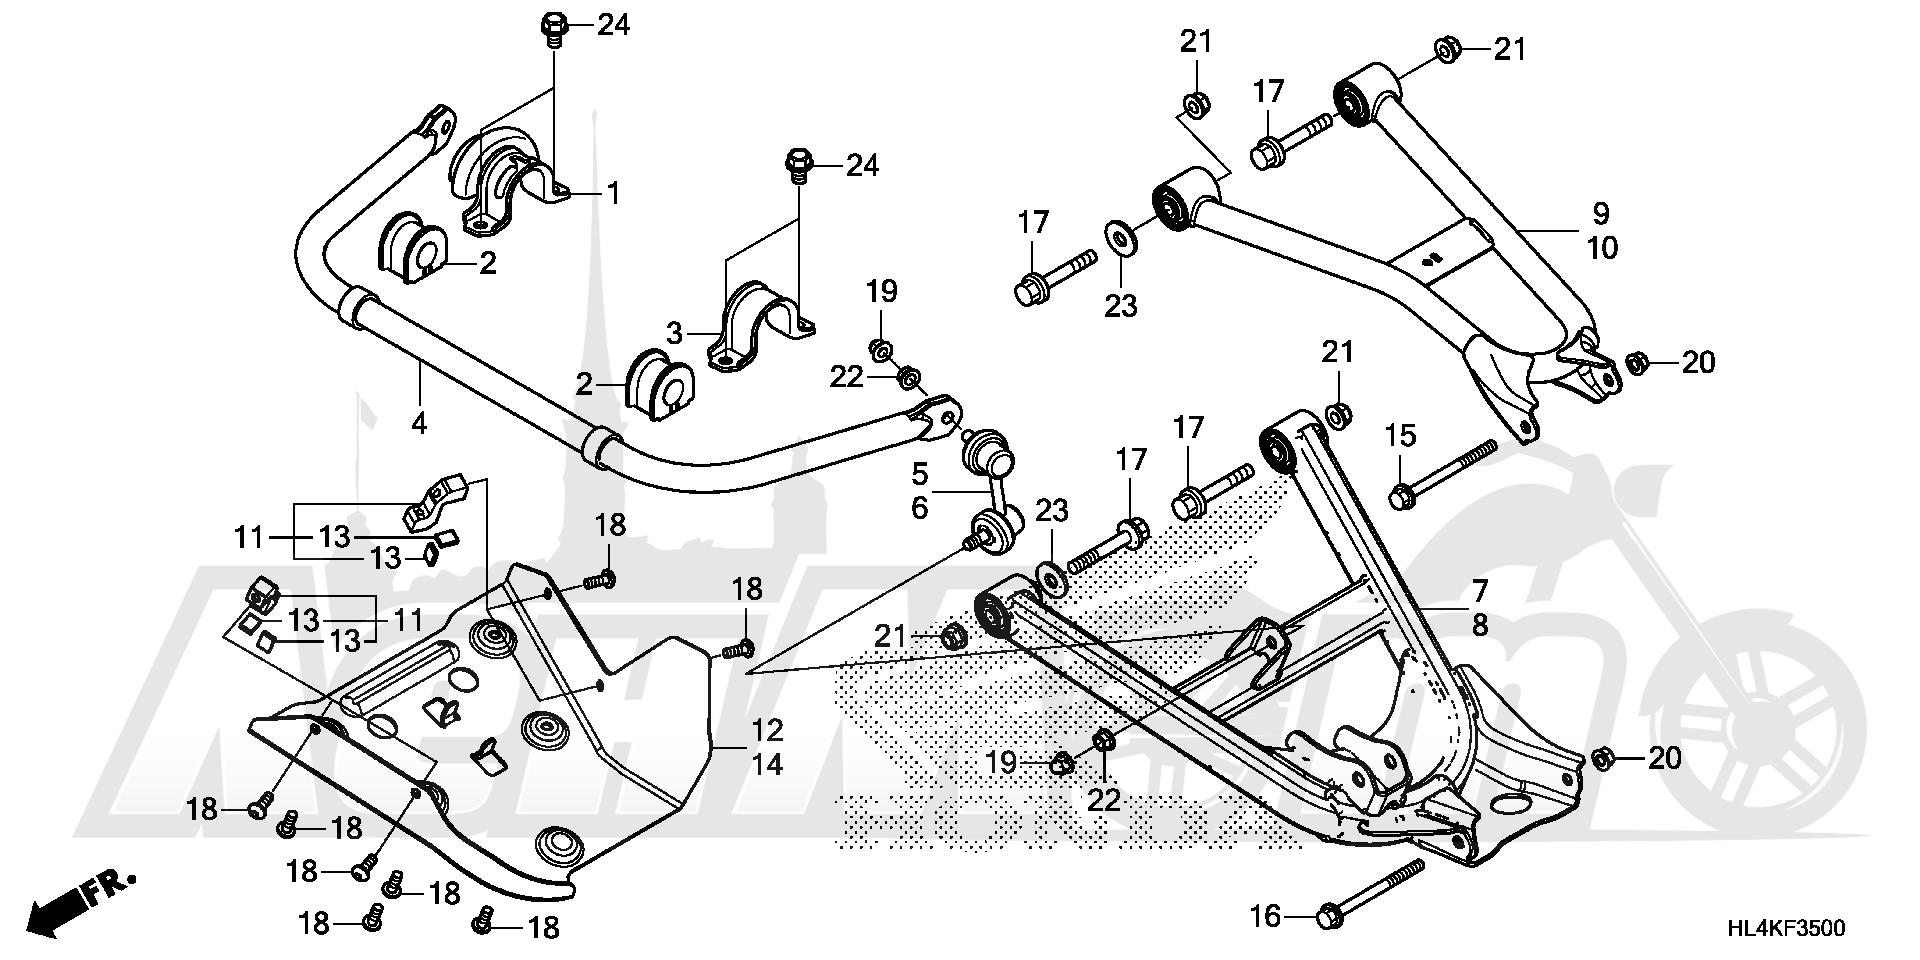 Запчасти для Квадроцикла Honda 2019 SXS1000M3L Раздел: REAR ARM AND REAR STABILIZER | задний рычаг и зад стабилизатор